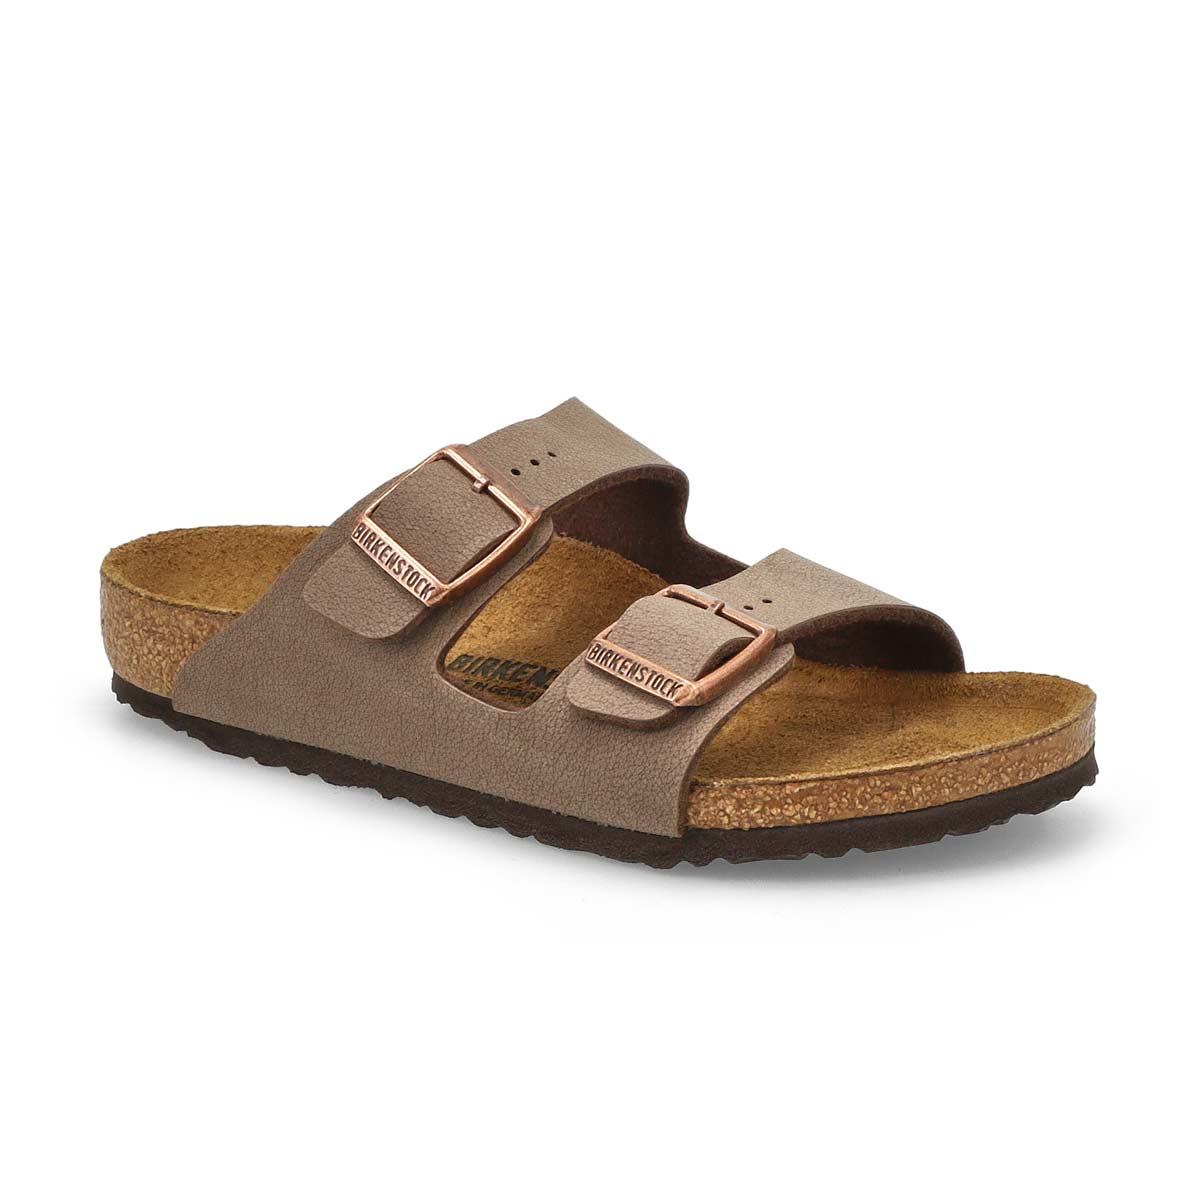 Kids' ARIZONA mocha 2 strap sandals - Narrow